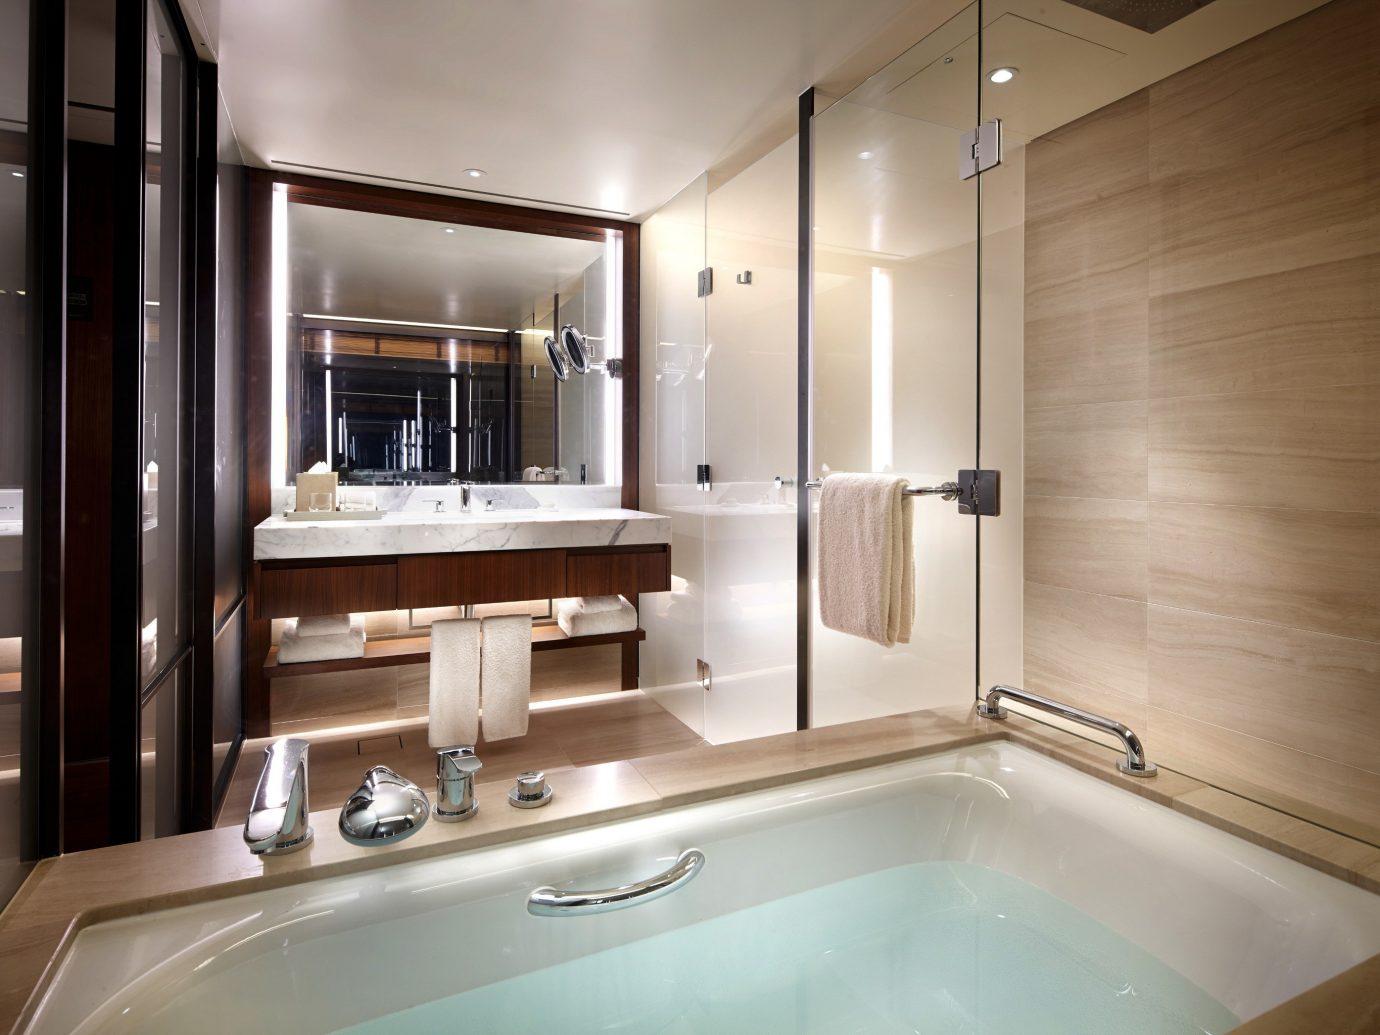 Hotels Luxury Travel indoor bathroom wall sink mirror vessel room interior design toilet counter plumbing fixture interior designer tub bathtub Bath